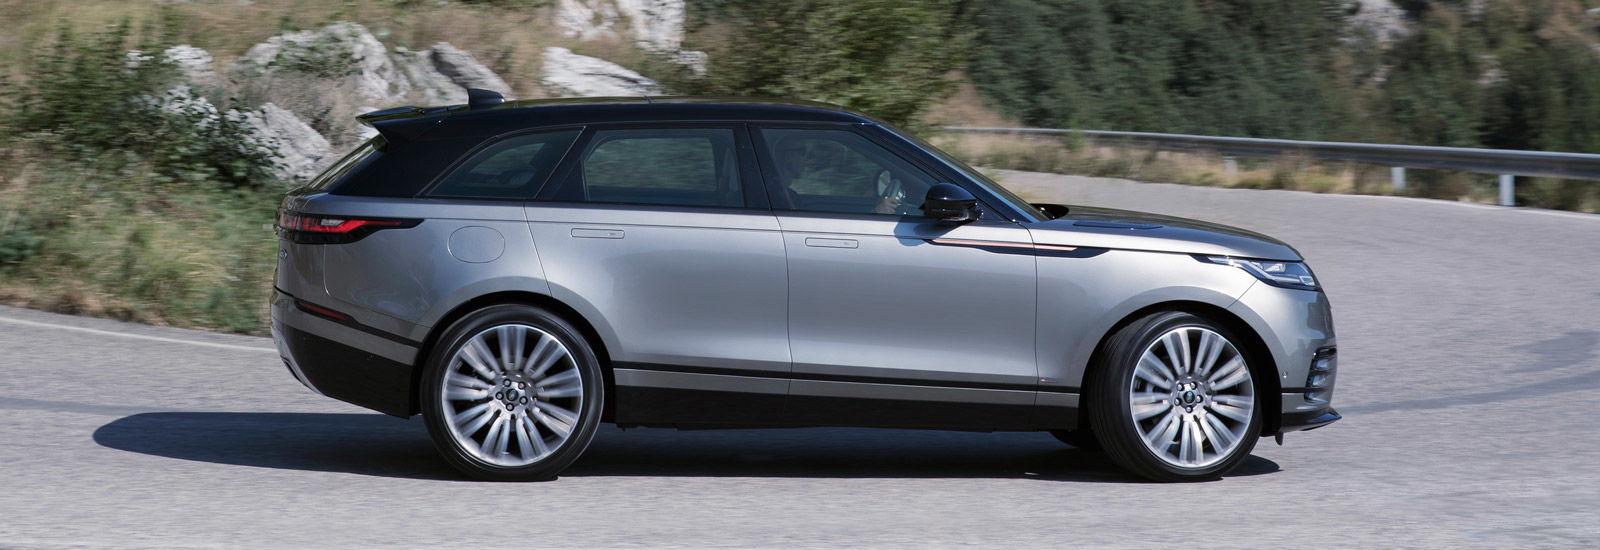 range rover velar coupe price specs release date carwow. Black Bedroom Furniture Sets. Home Design Ideas